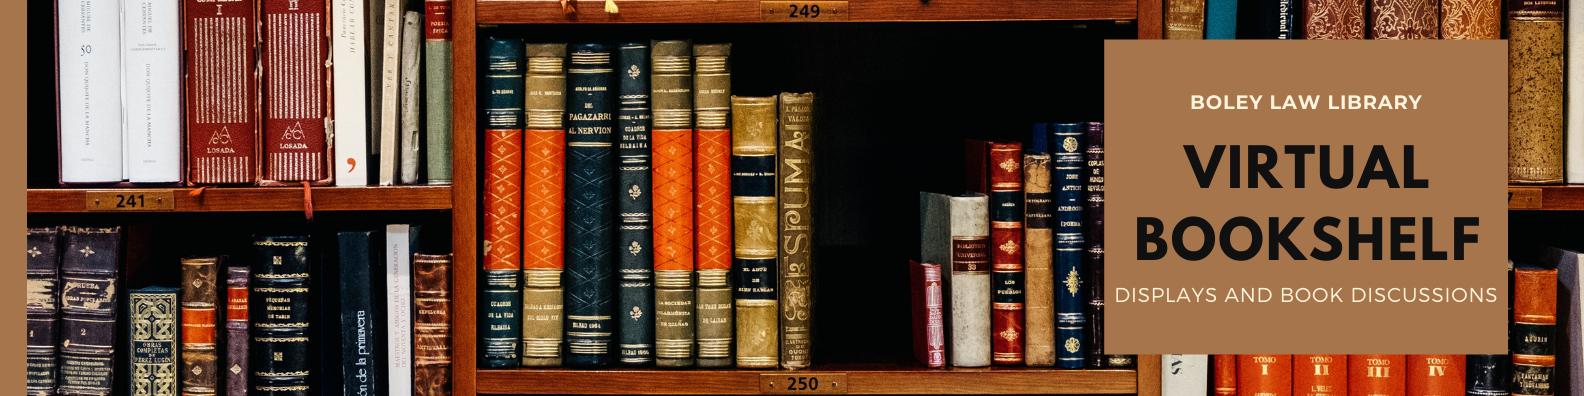 Banner for Virtual Bookshelf- multi colored books on book shelf